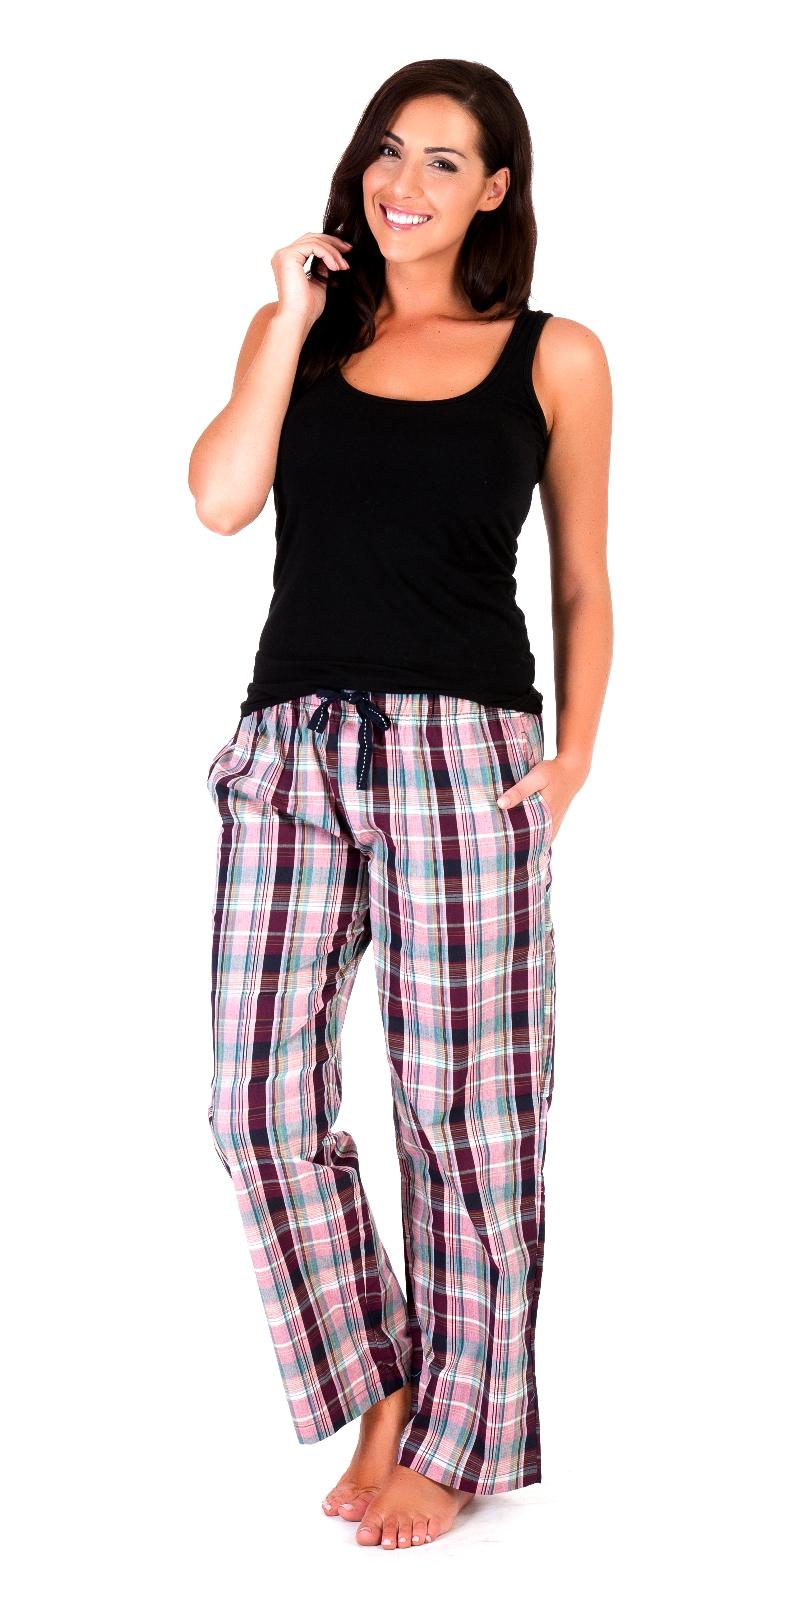 Womens Nightwear Casual Lounge Pants Ladies Pyjamas PJ Bottoms Warm ... 18788a6a0